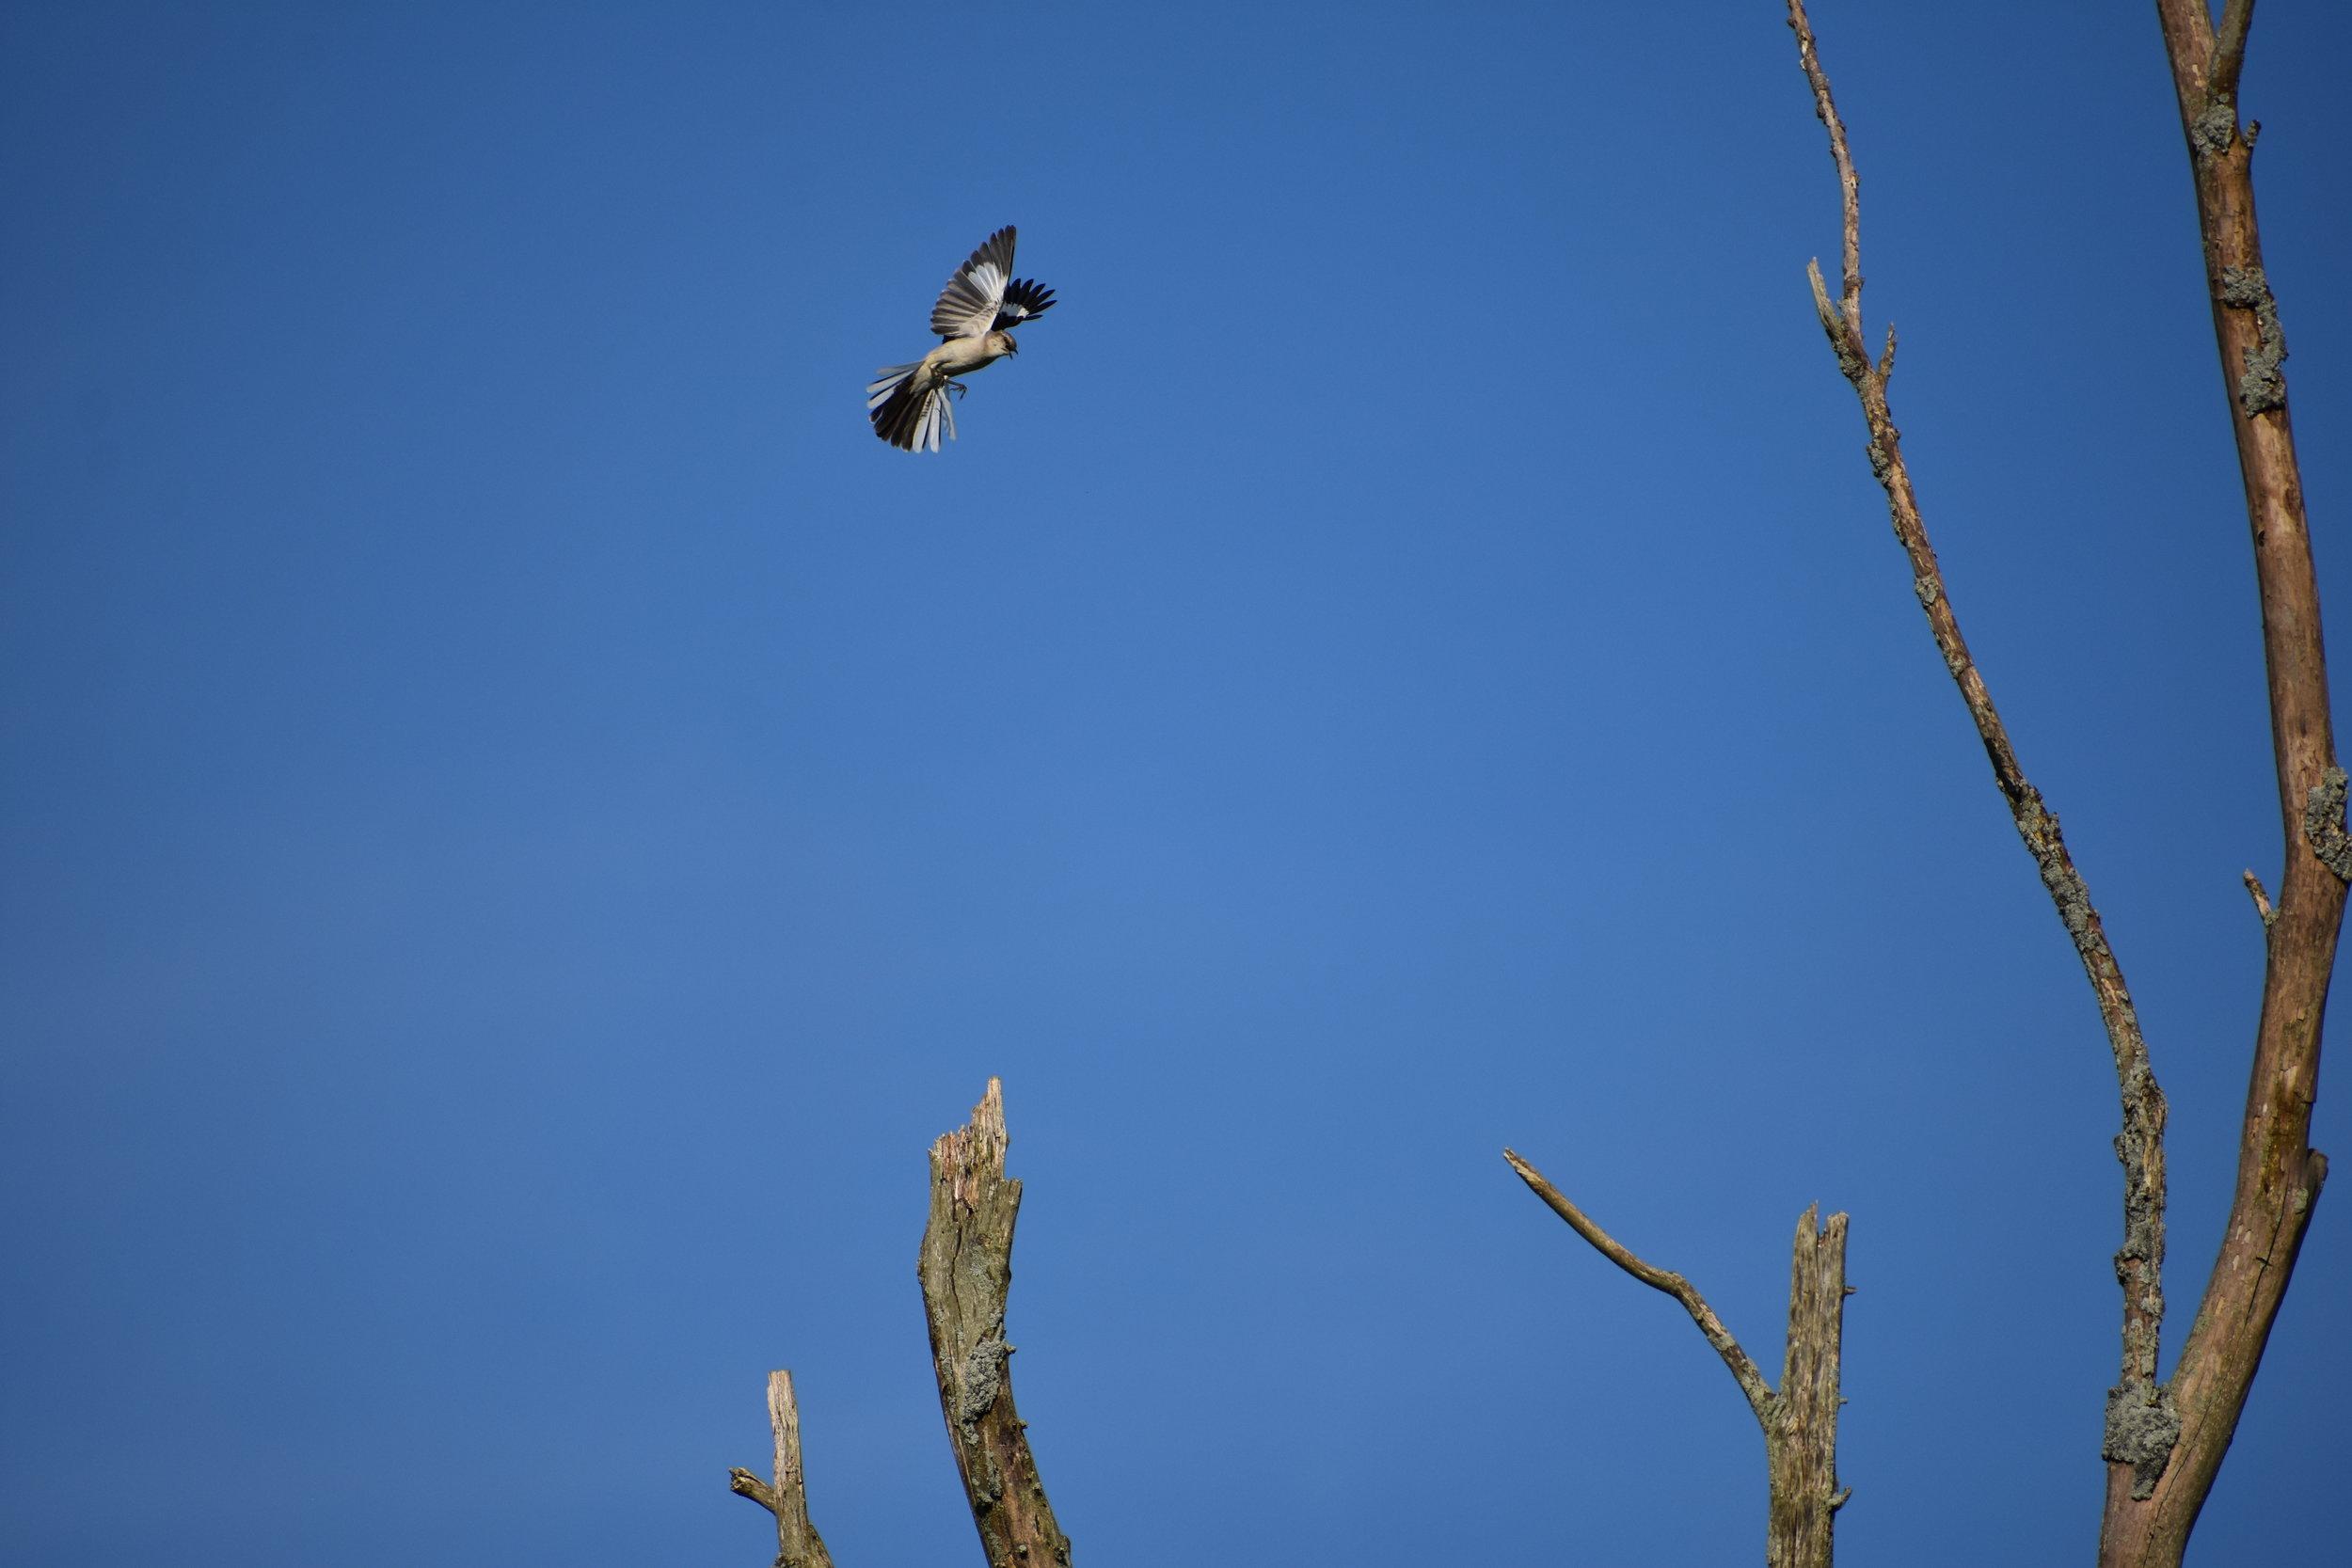 Northern Mockingbird flying to Dead Tree